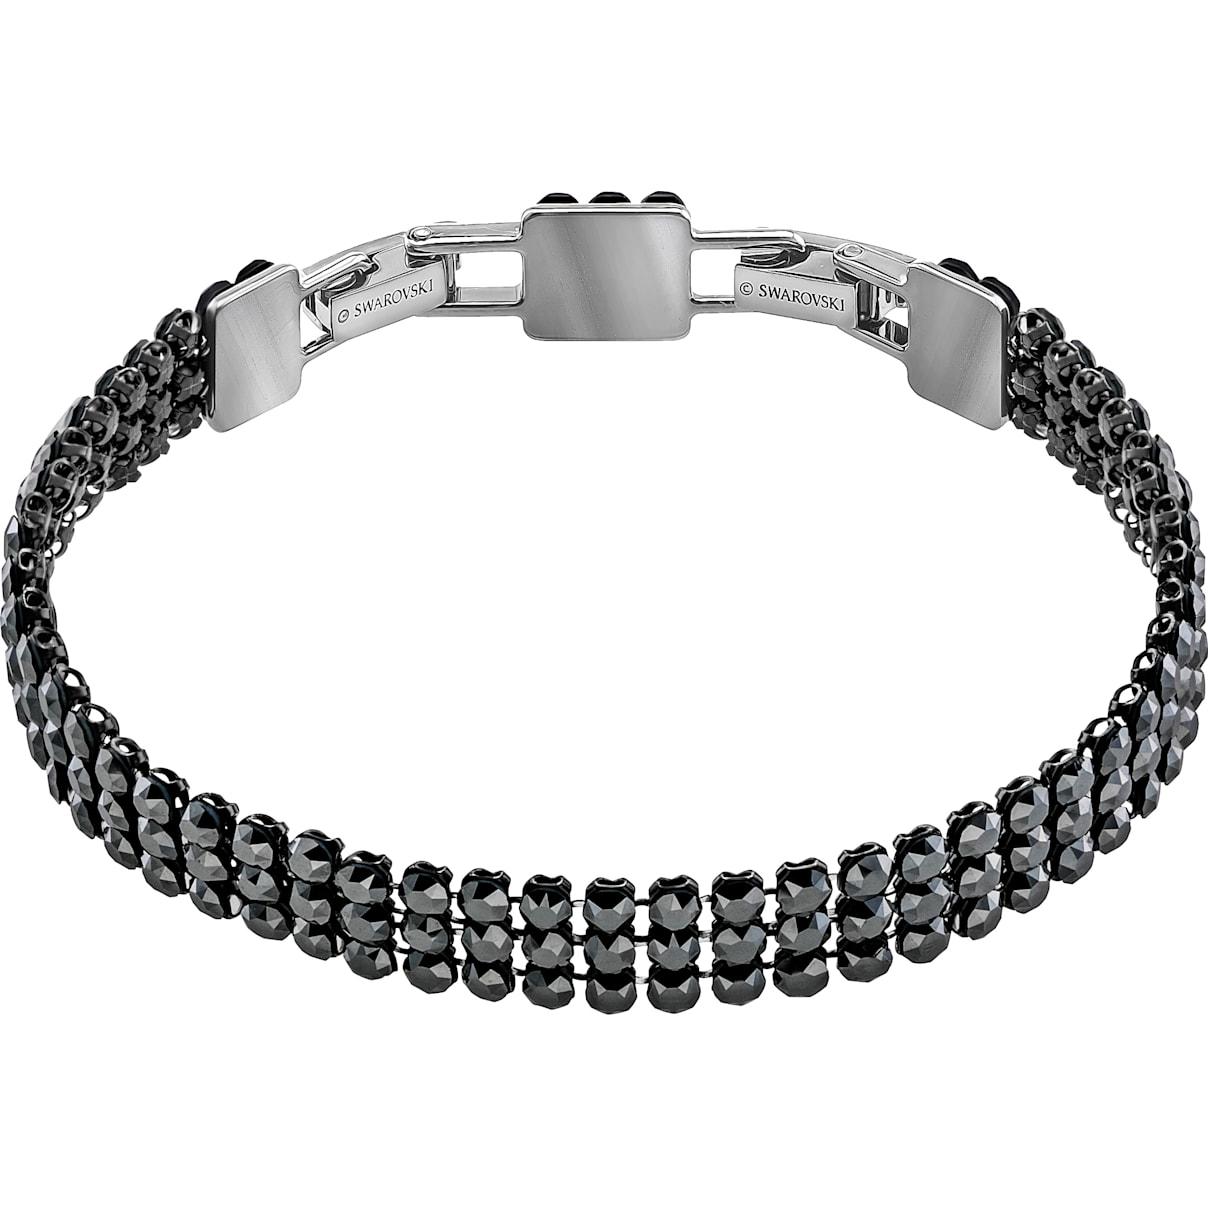 Swarovski Fit Bracelet, Black, Ruthenium plated